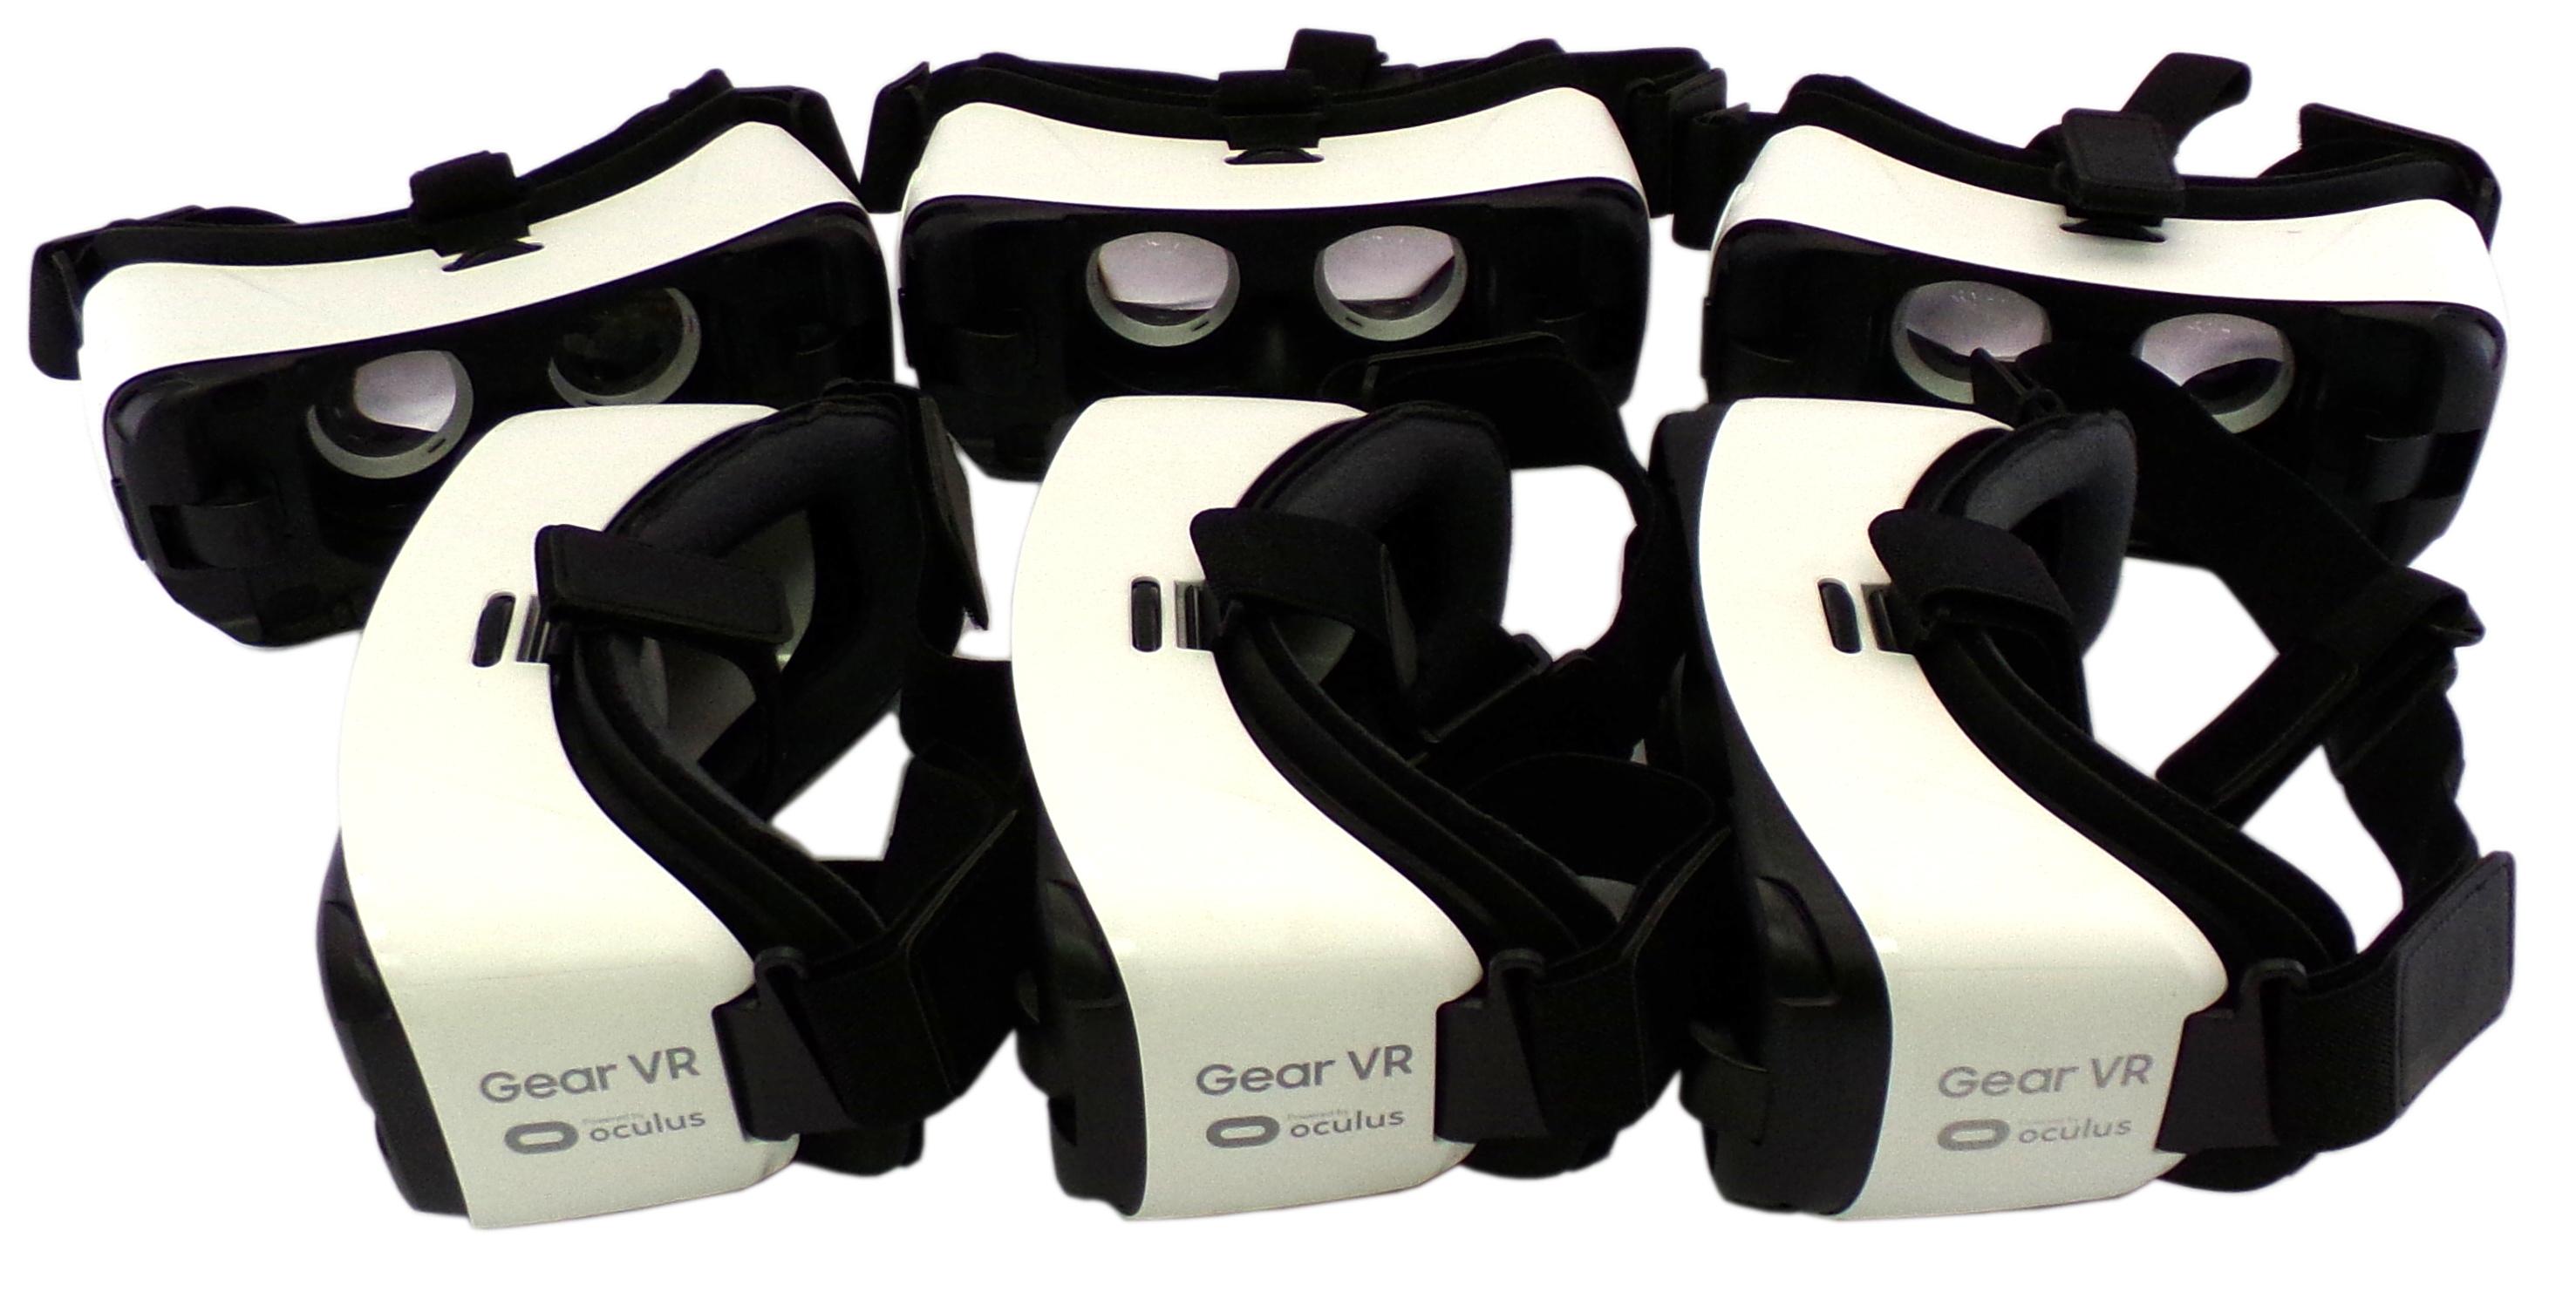 6x SM-R322 Samsung Gear VR Virtual Reality Headset Micro USB - Frost White